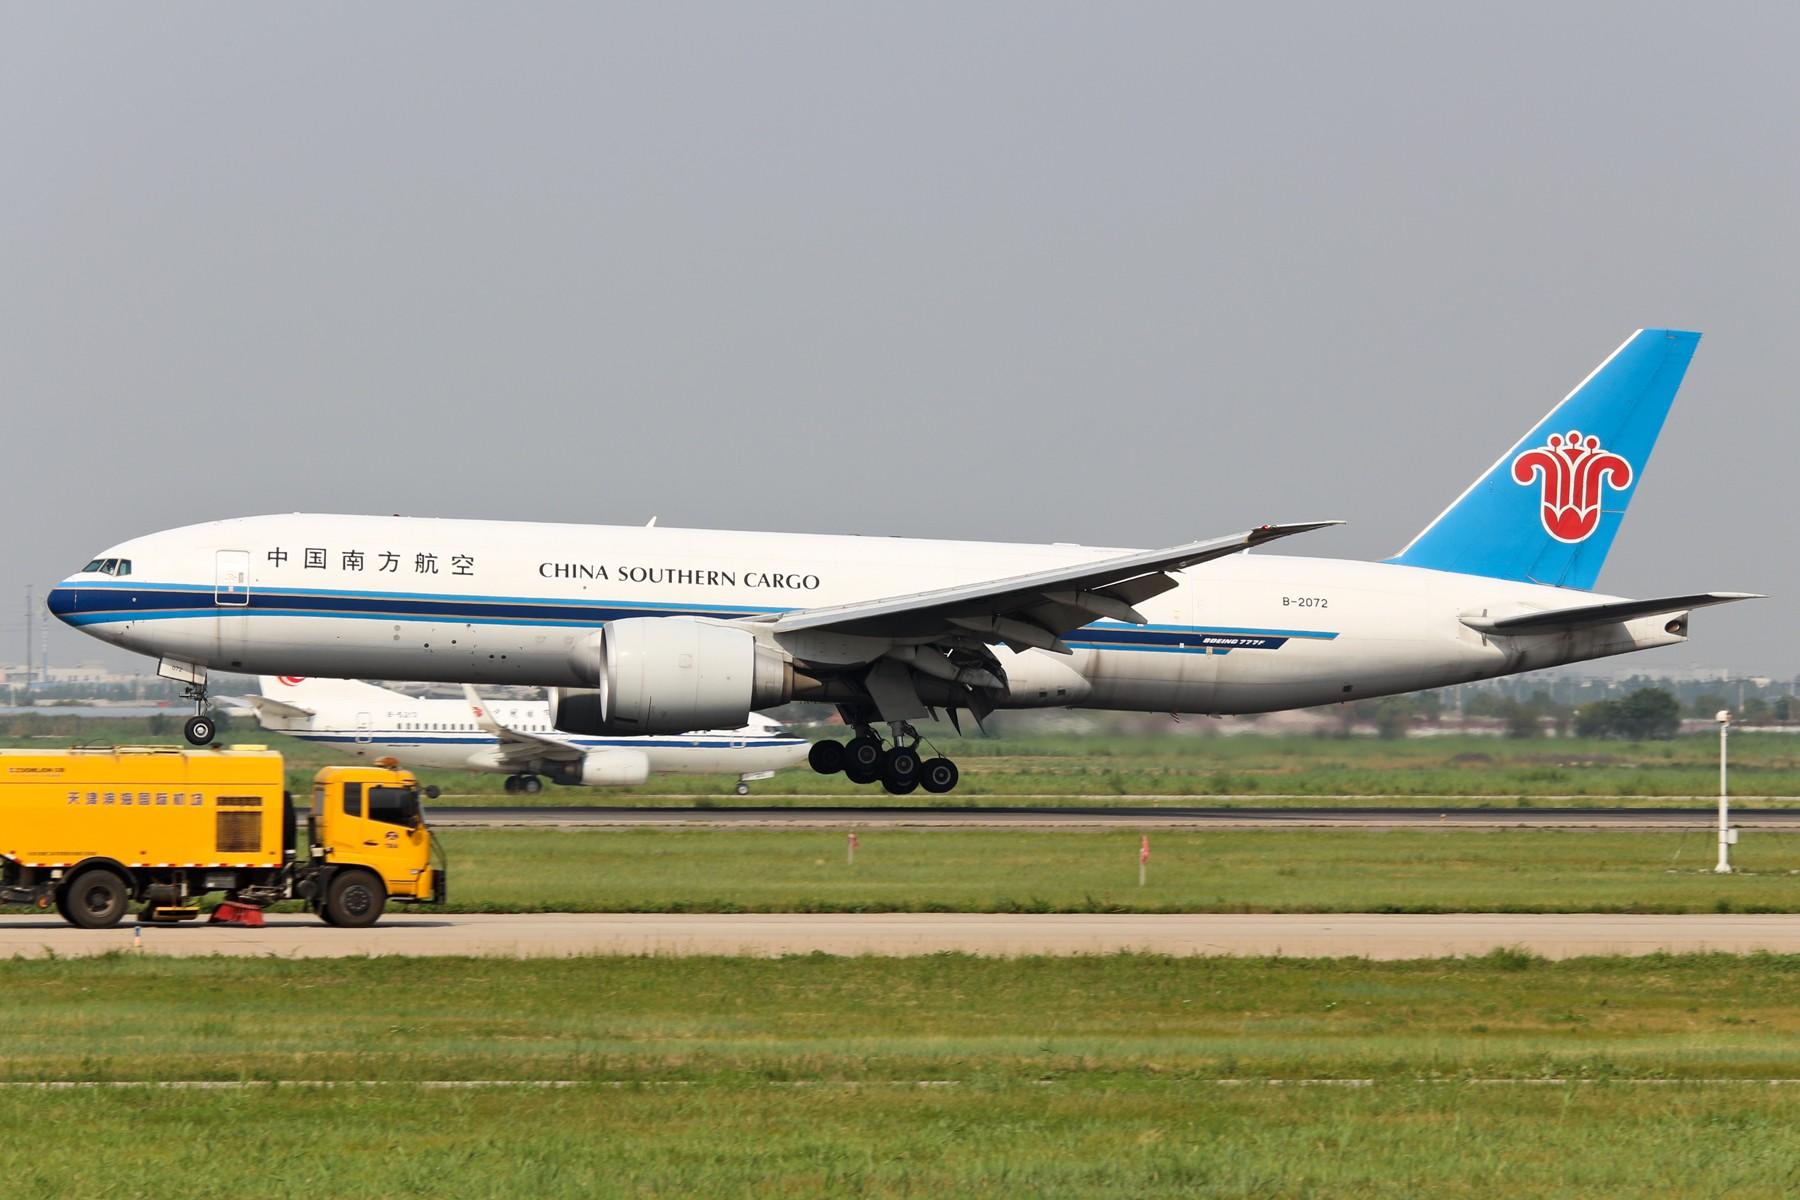 Re:[原创]【TSN飞友会】1800*1200 近期TSN集锦 不看绝对后悔 BOEING 777-200 B-2072 中国天津滨海国际机场